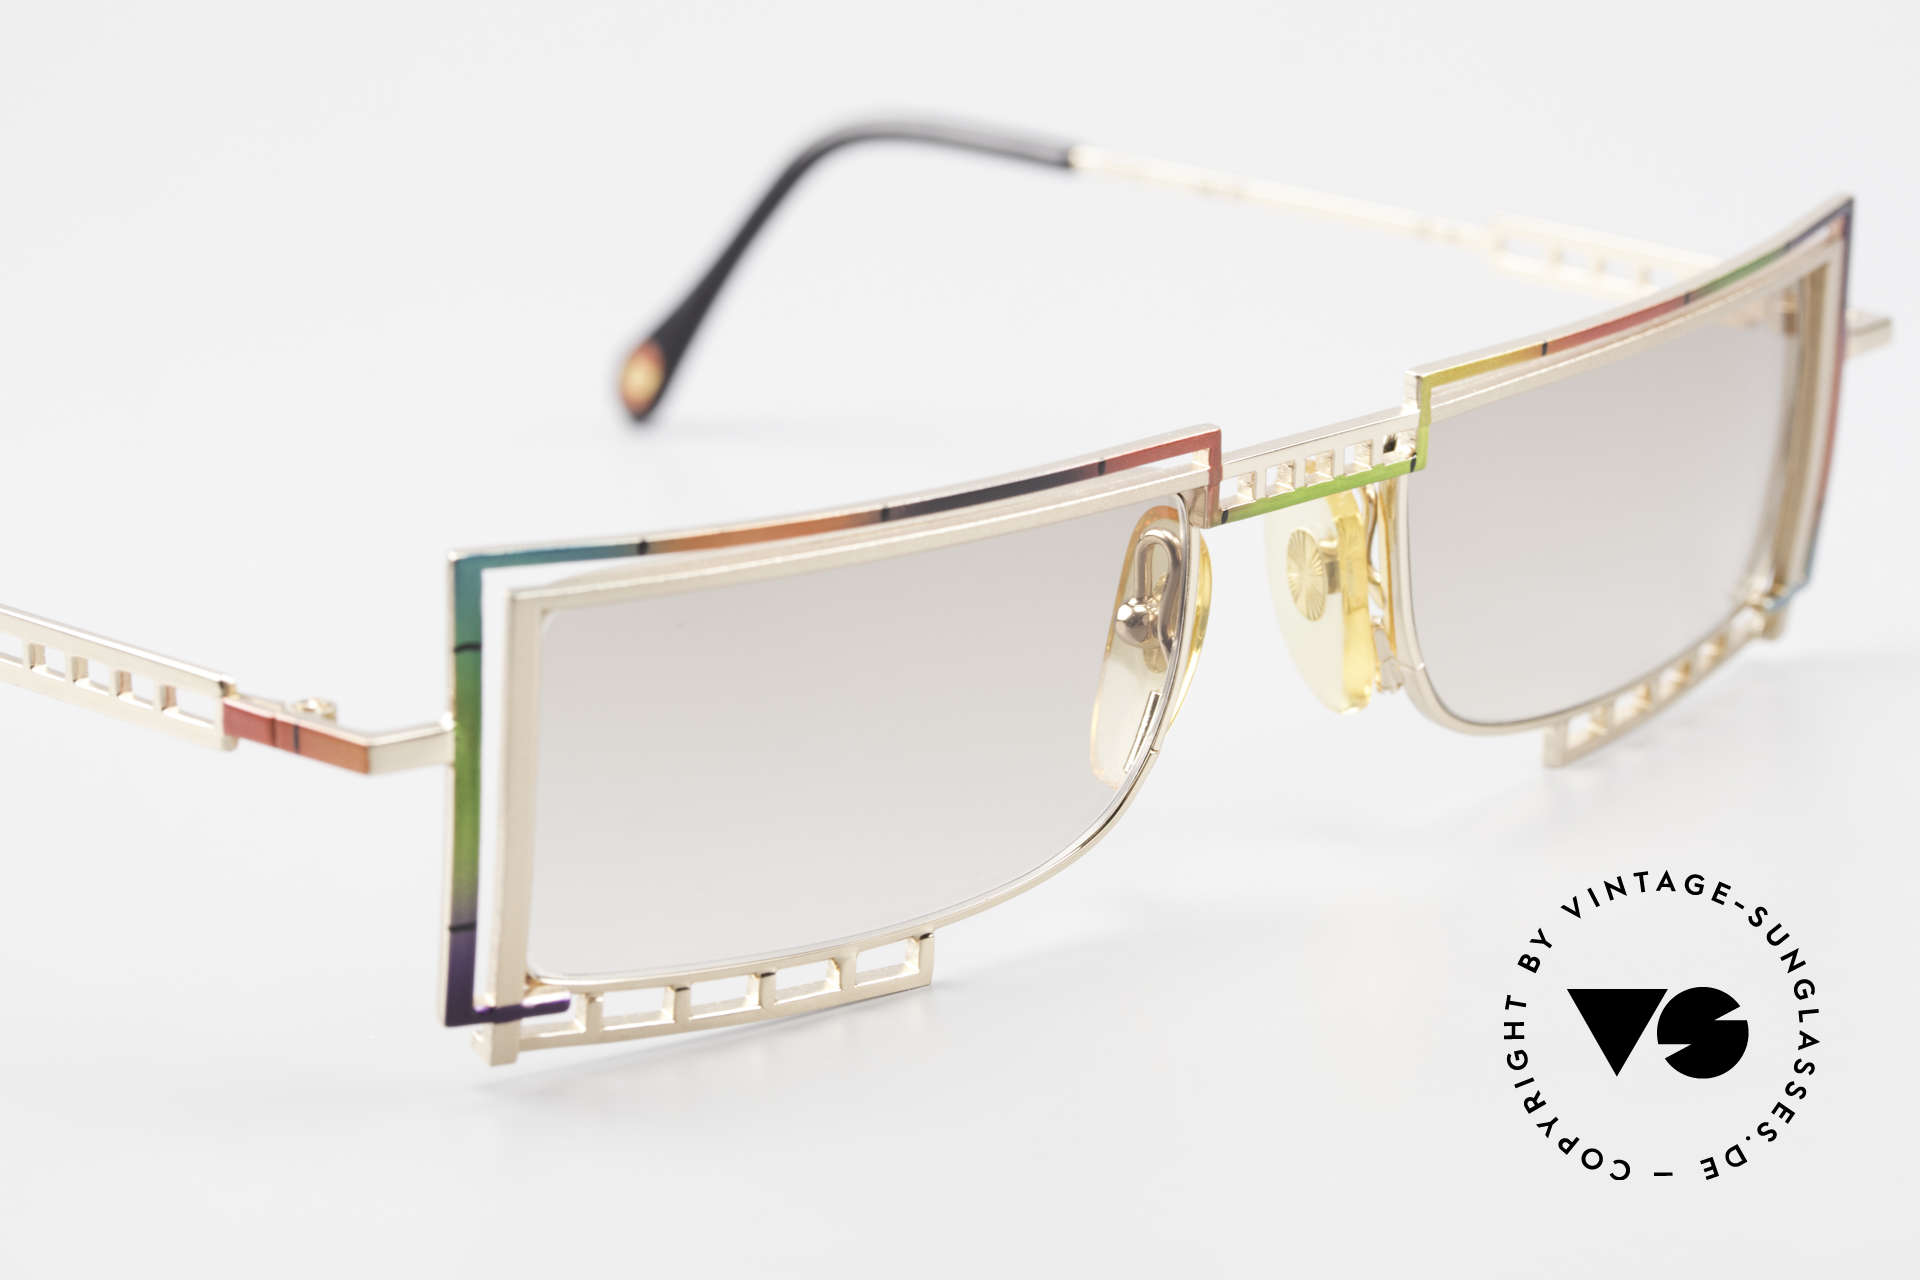 Casanova LC4 Square Vintage Sunglasses, NO retro shades, but a unique old designer ORIGINAL, Made for Men and Women